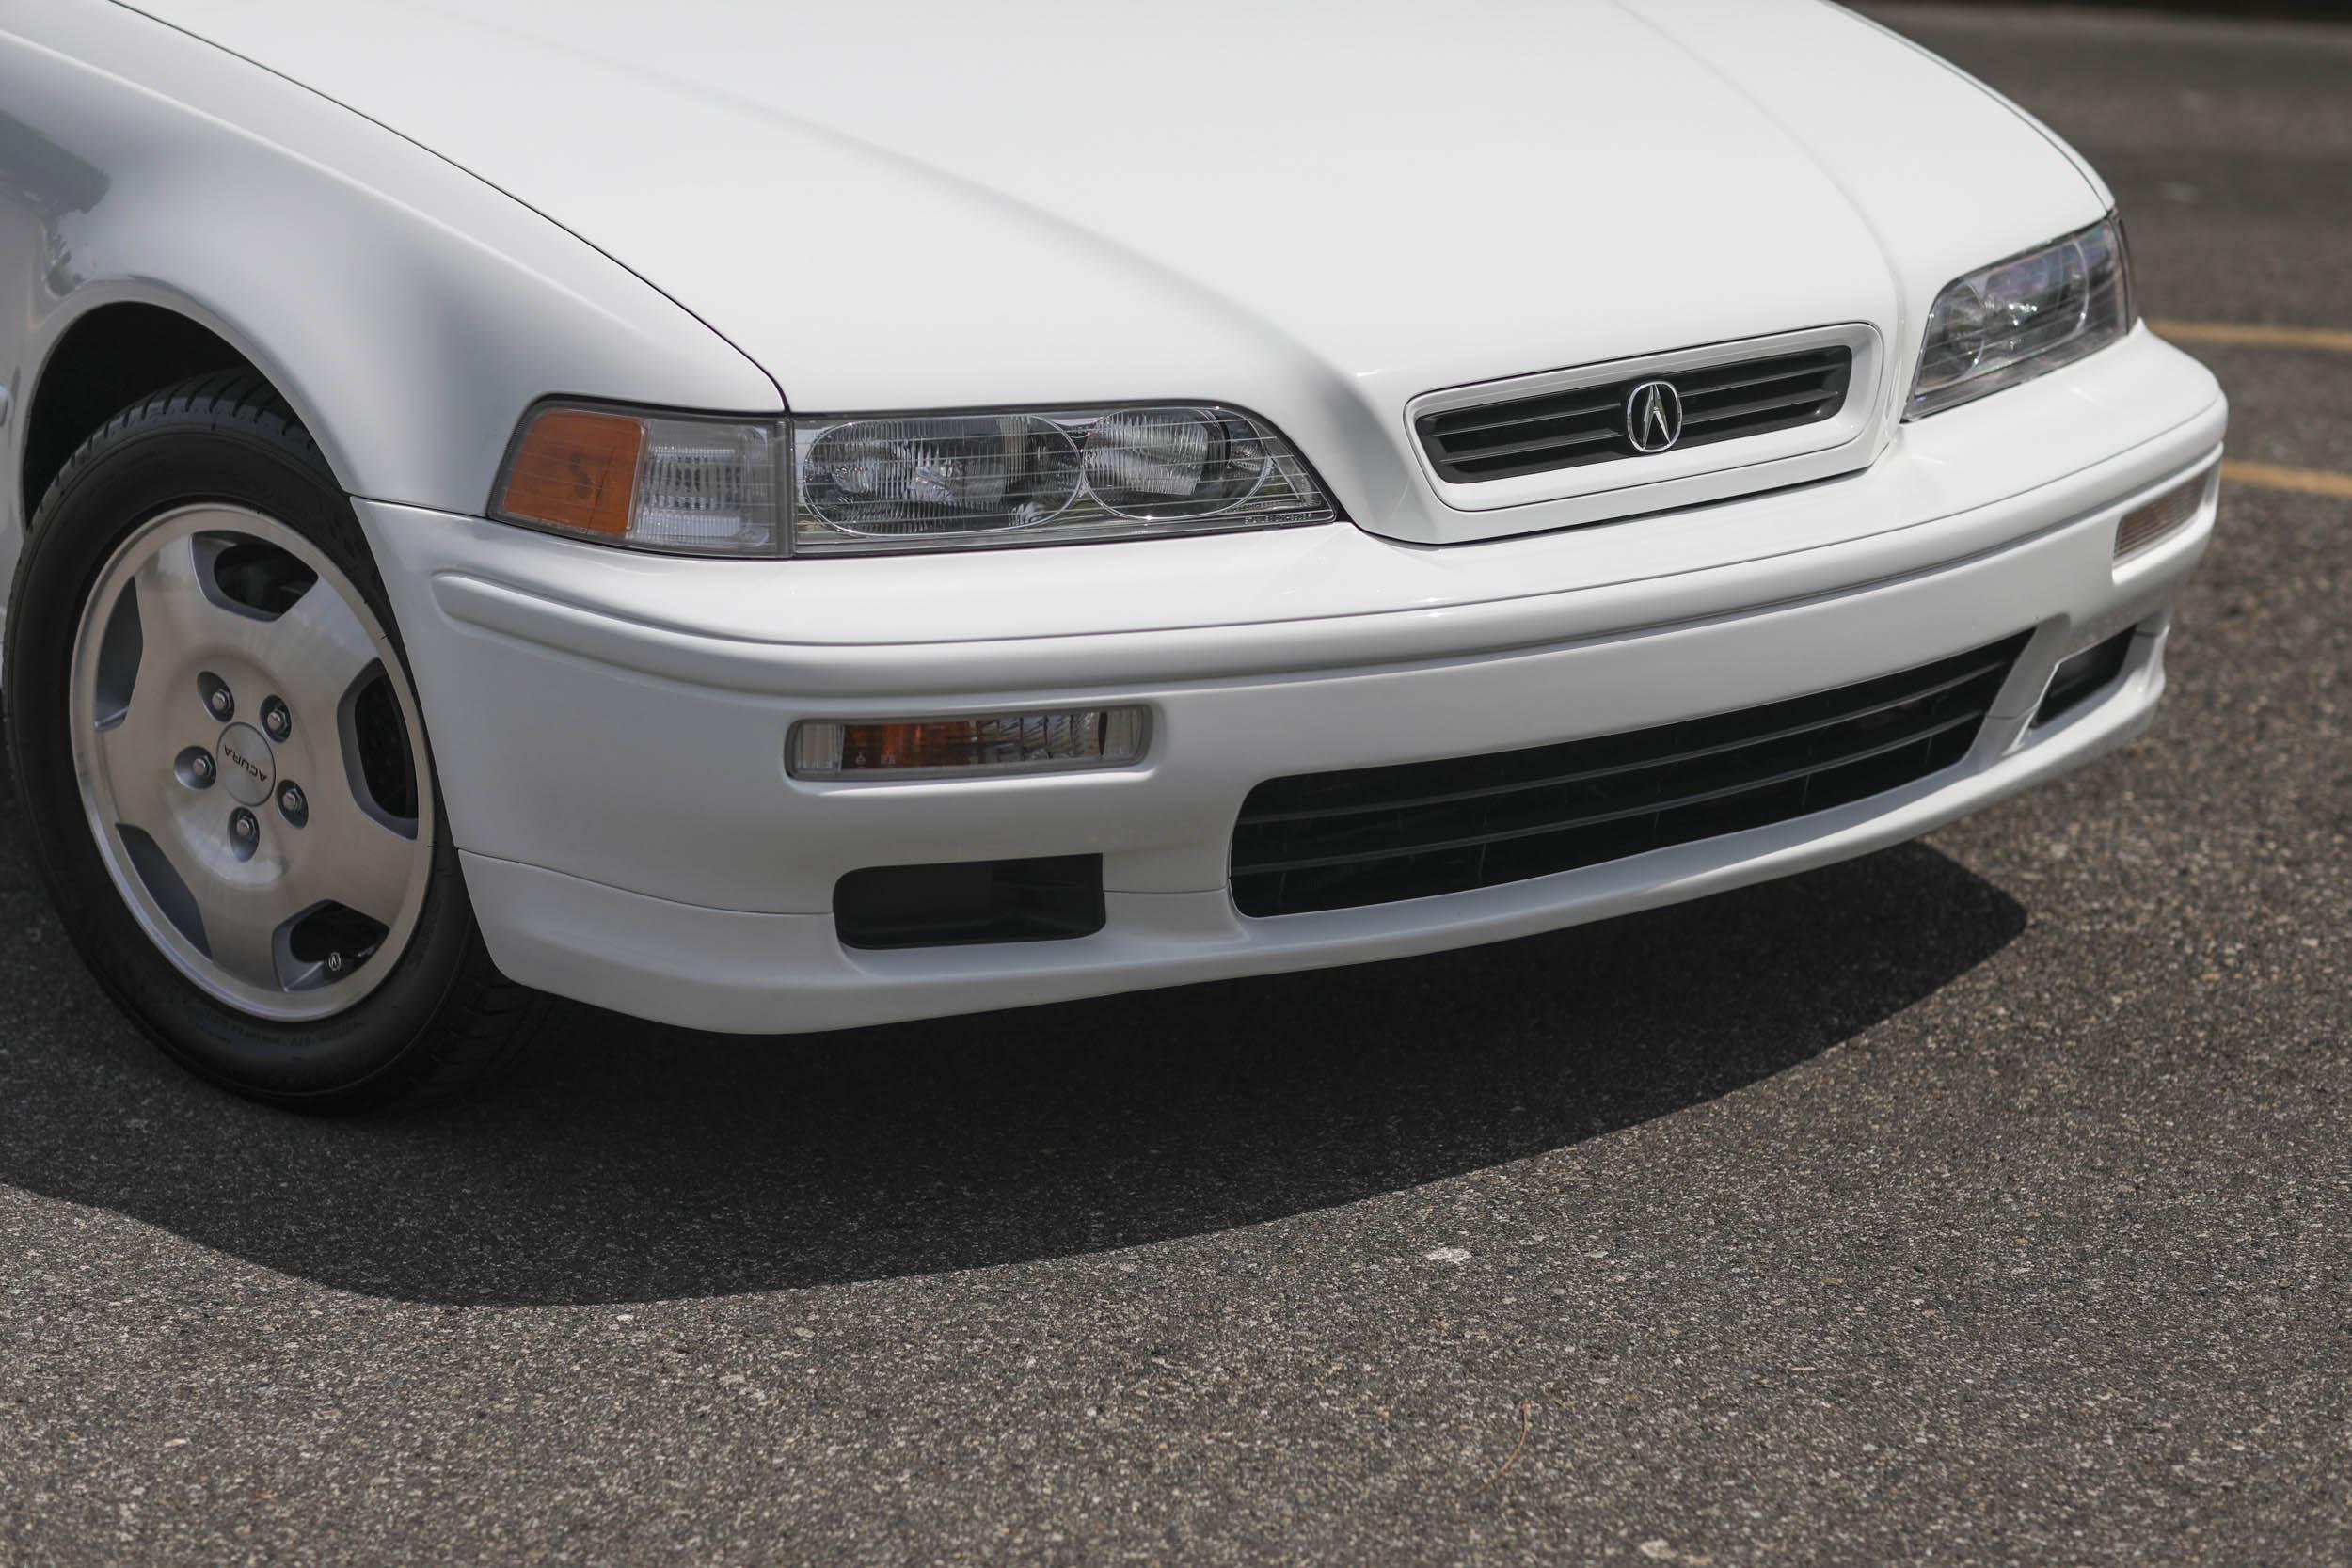 1994 Acura Legend Coupe LS nose